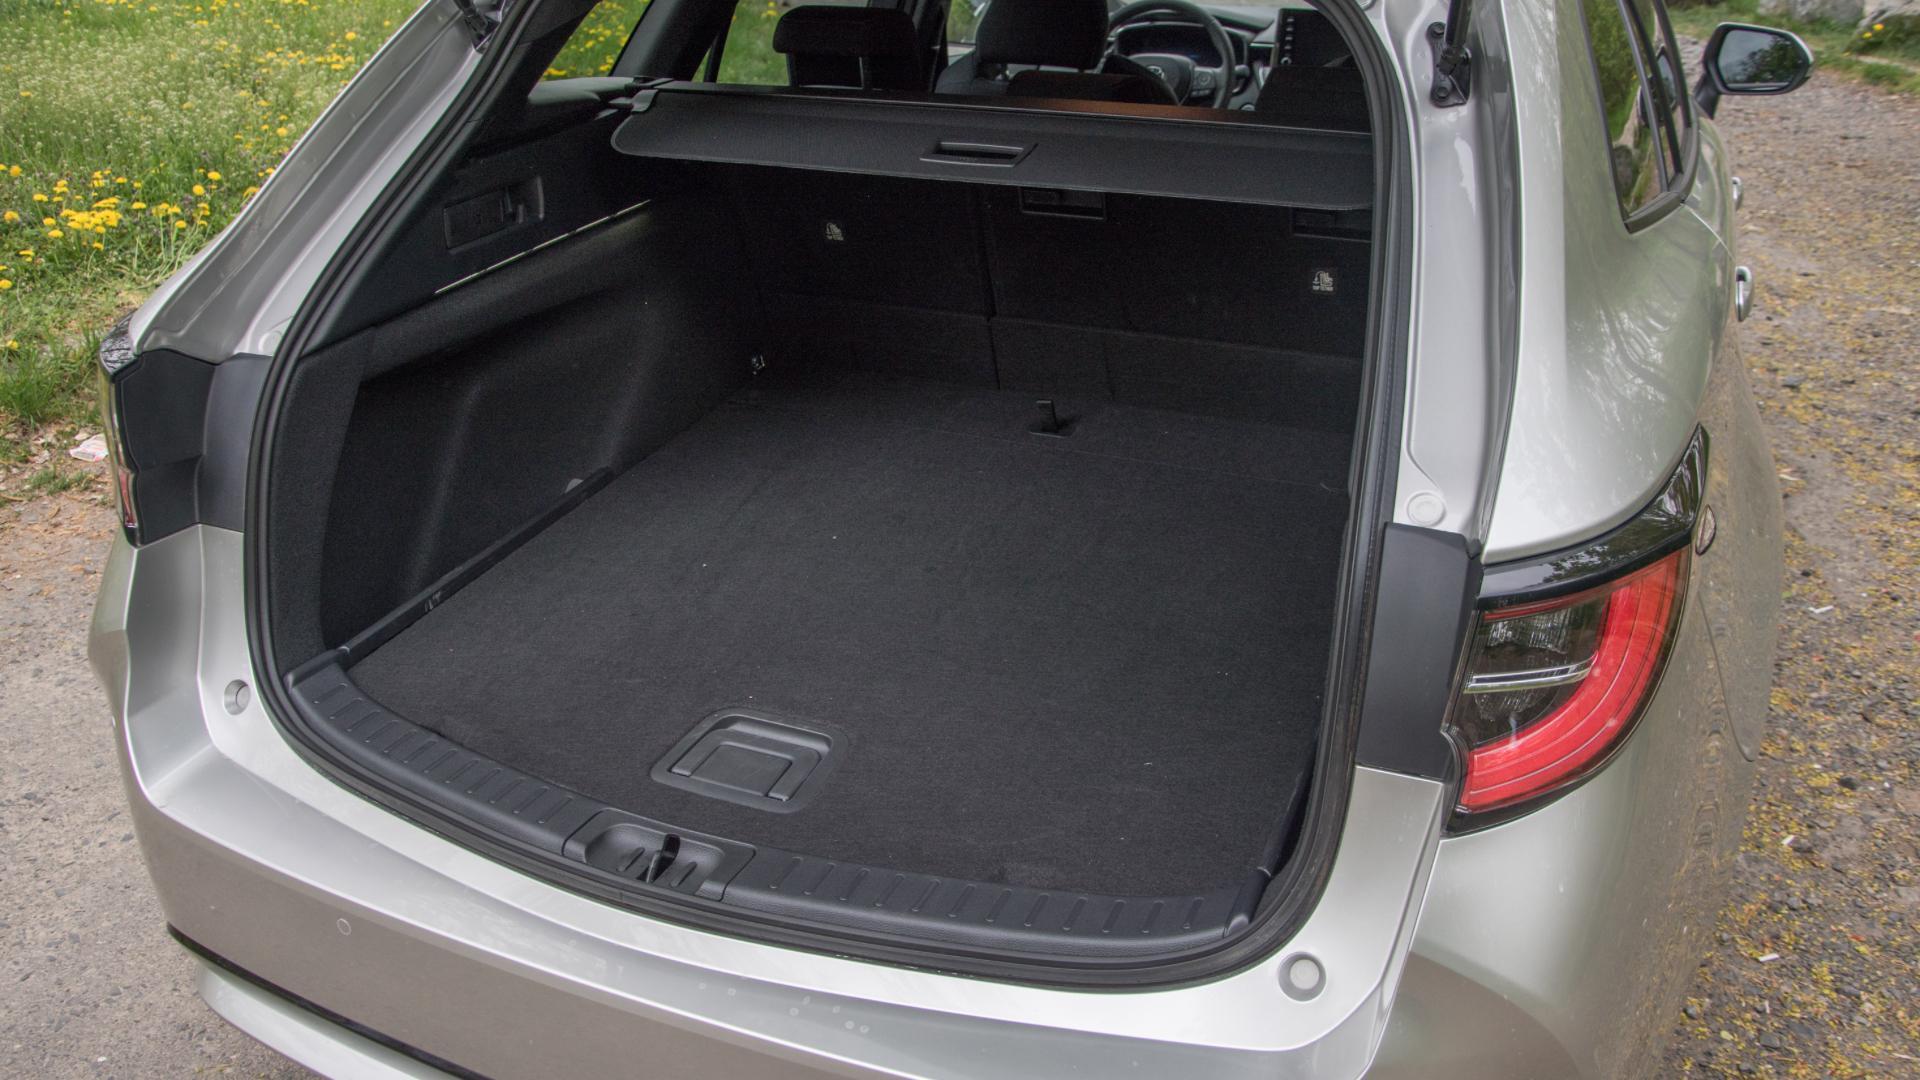 Zavazadlový prostor Toyoty Corolly Touring Sports